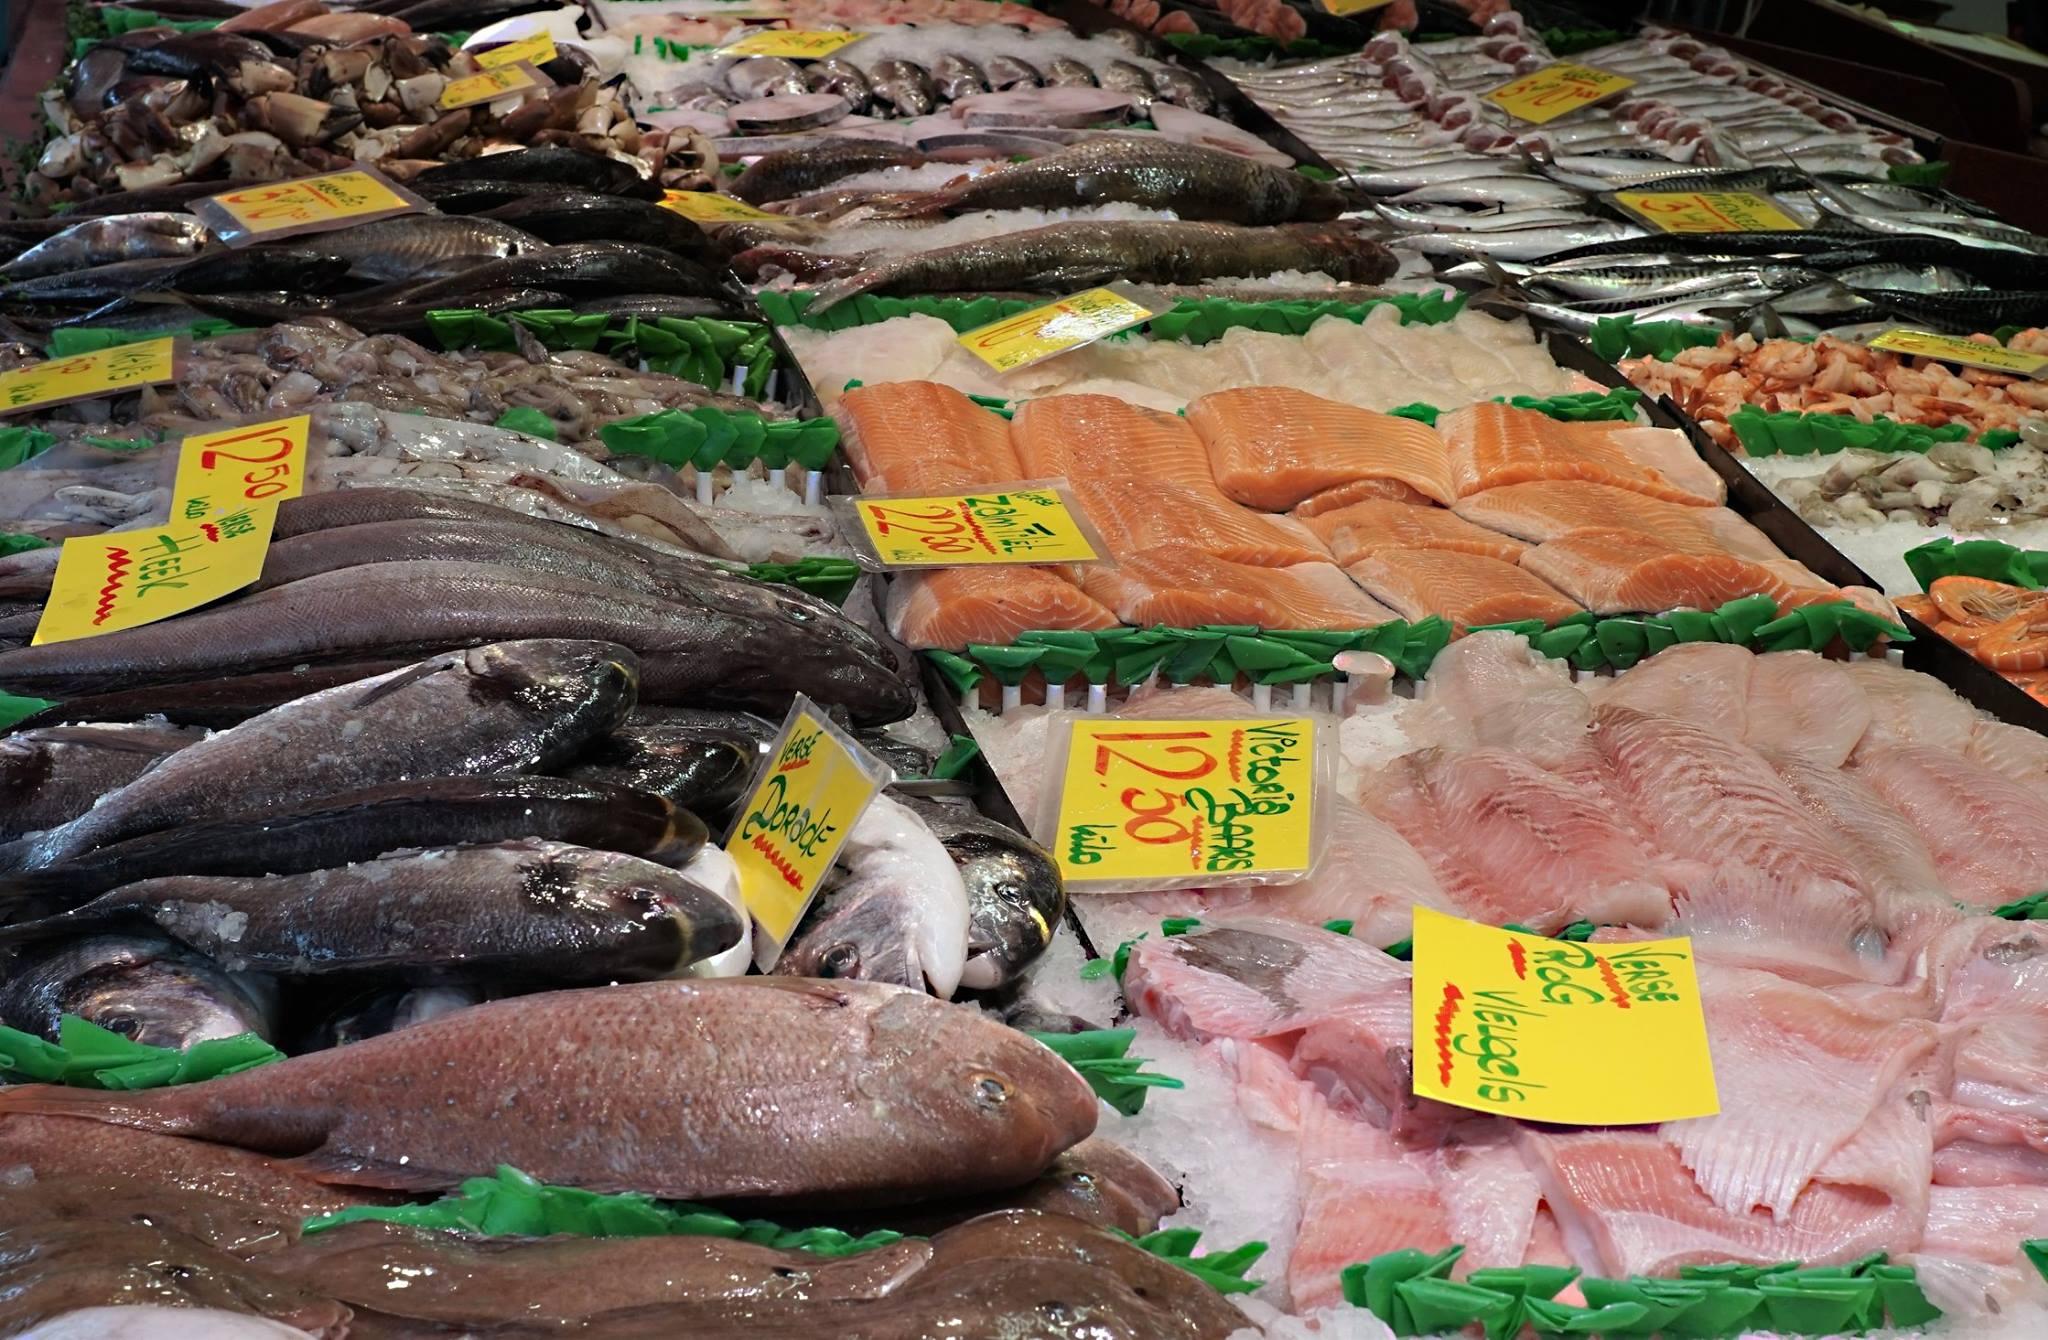 Vishandel Brouwer 12